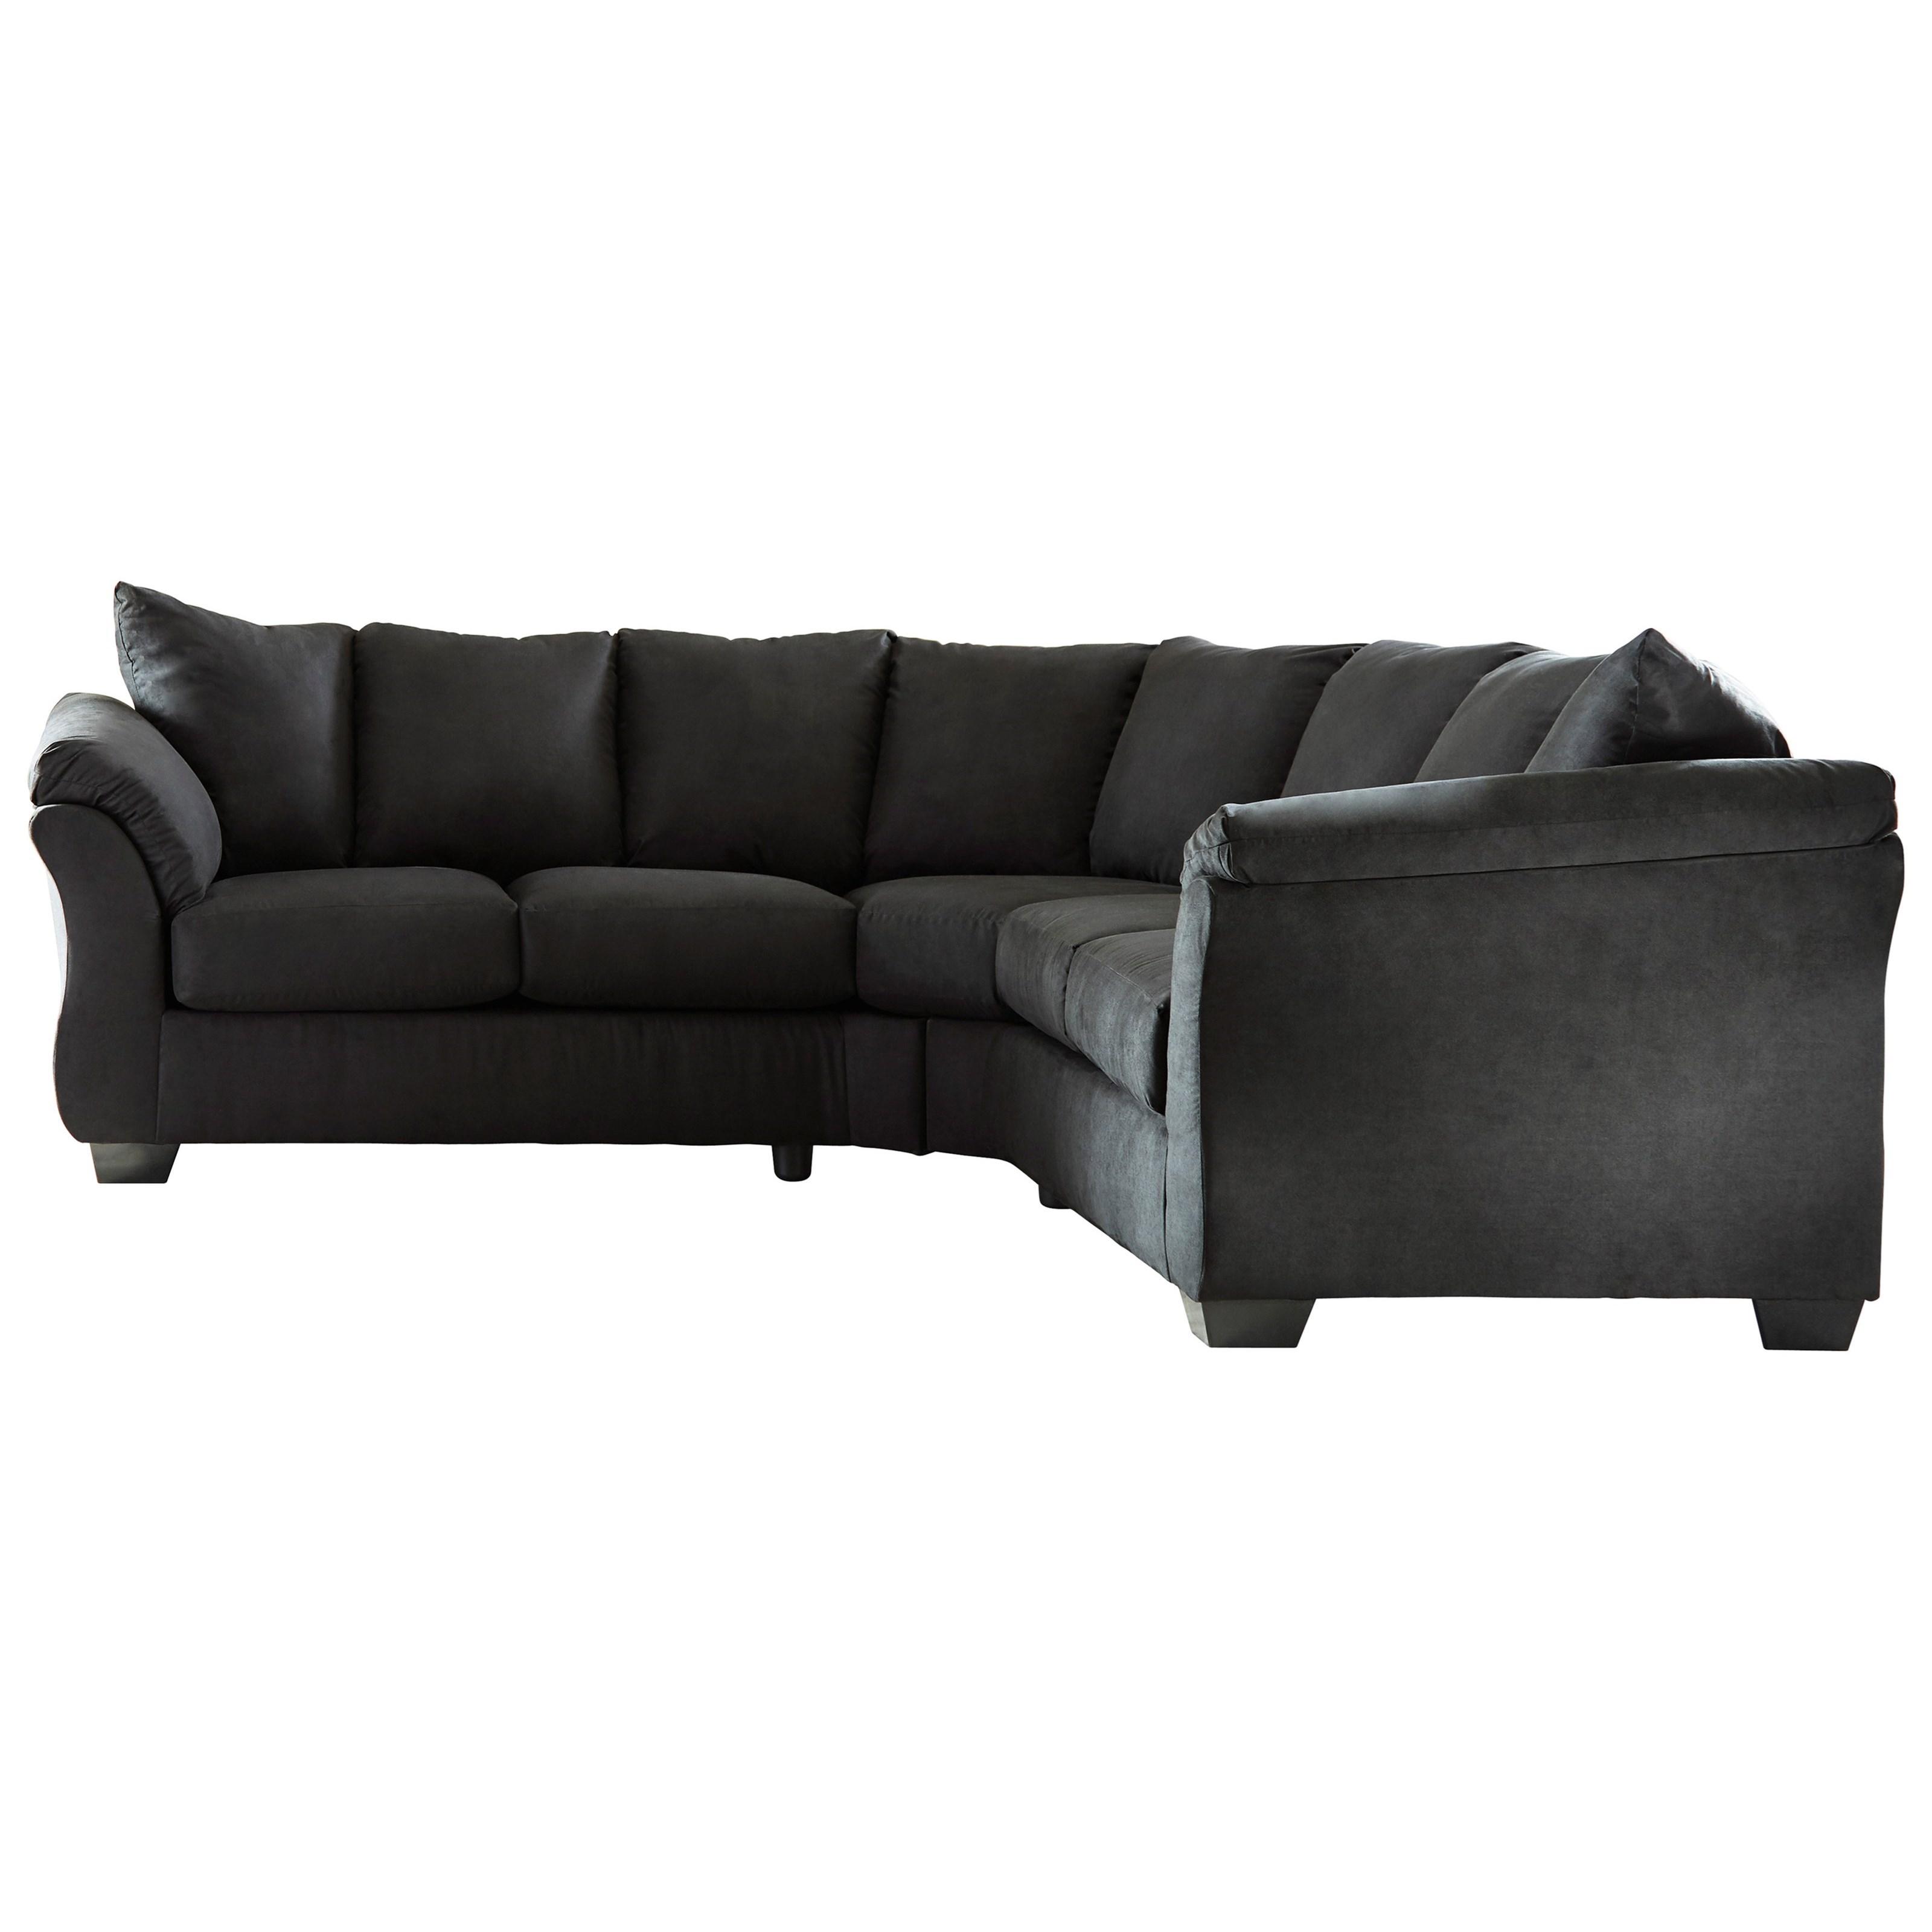 Merveilleux Signature Design By Ashley Darcy   BlackSectional Sofa ...